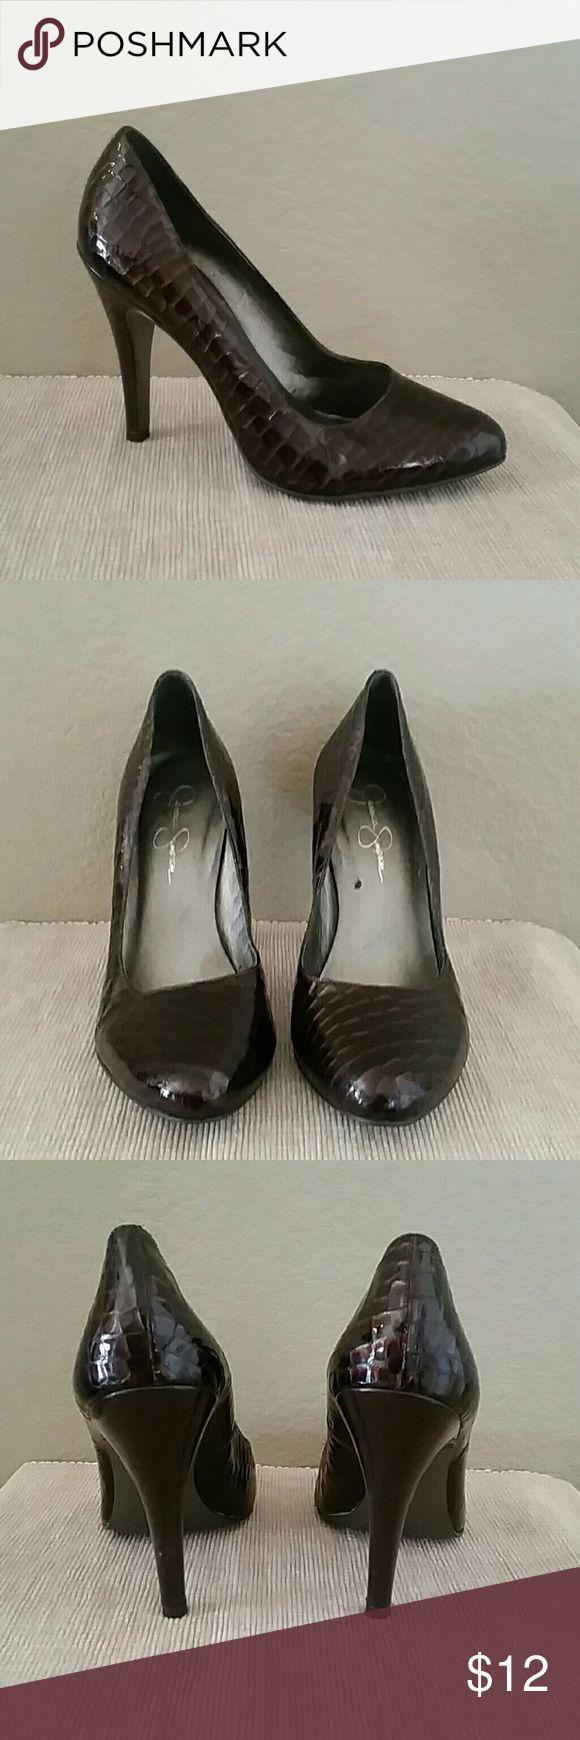 Brown Jessica Simpson heels pumps Jessica Simpson heels, size 8 1/2, some wear-see pics, brown, 4 1/2 inch heel Jessica Simpson Shoes Heels